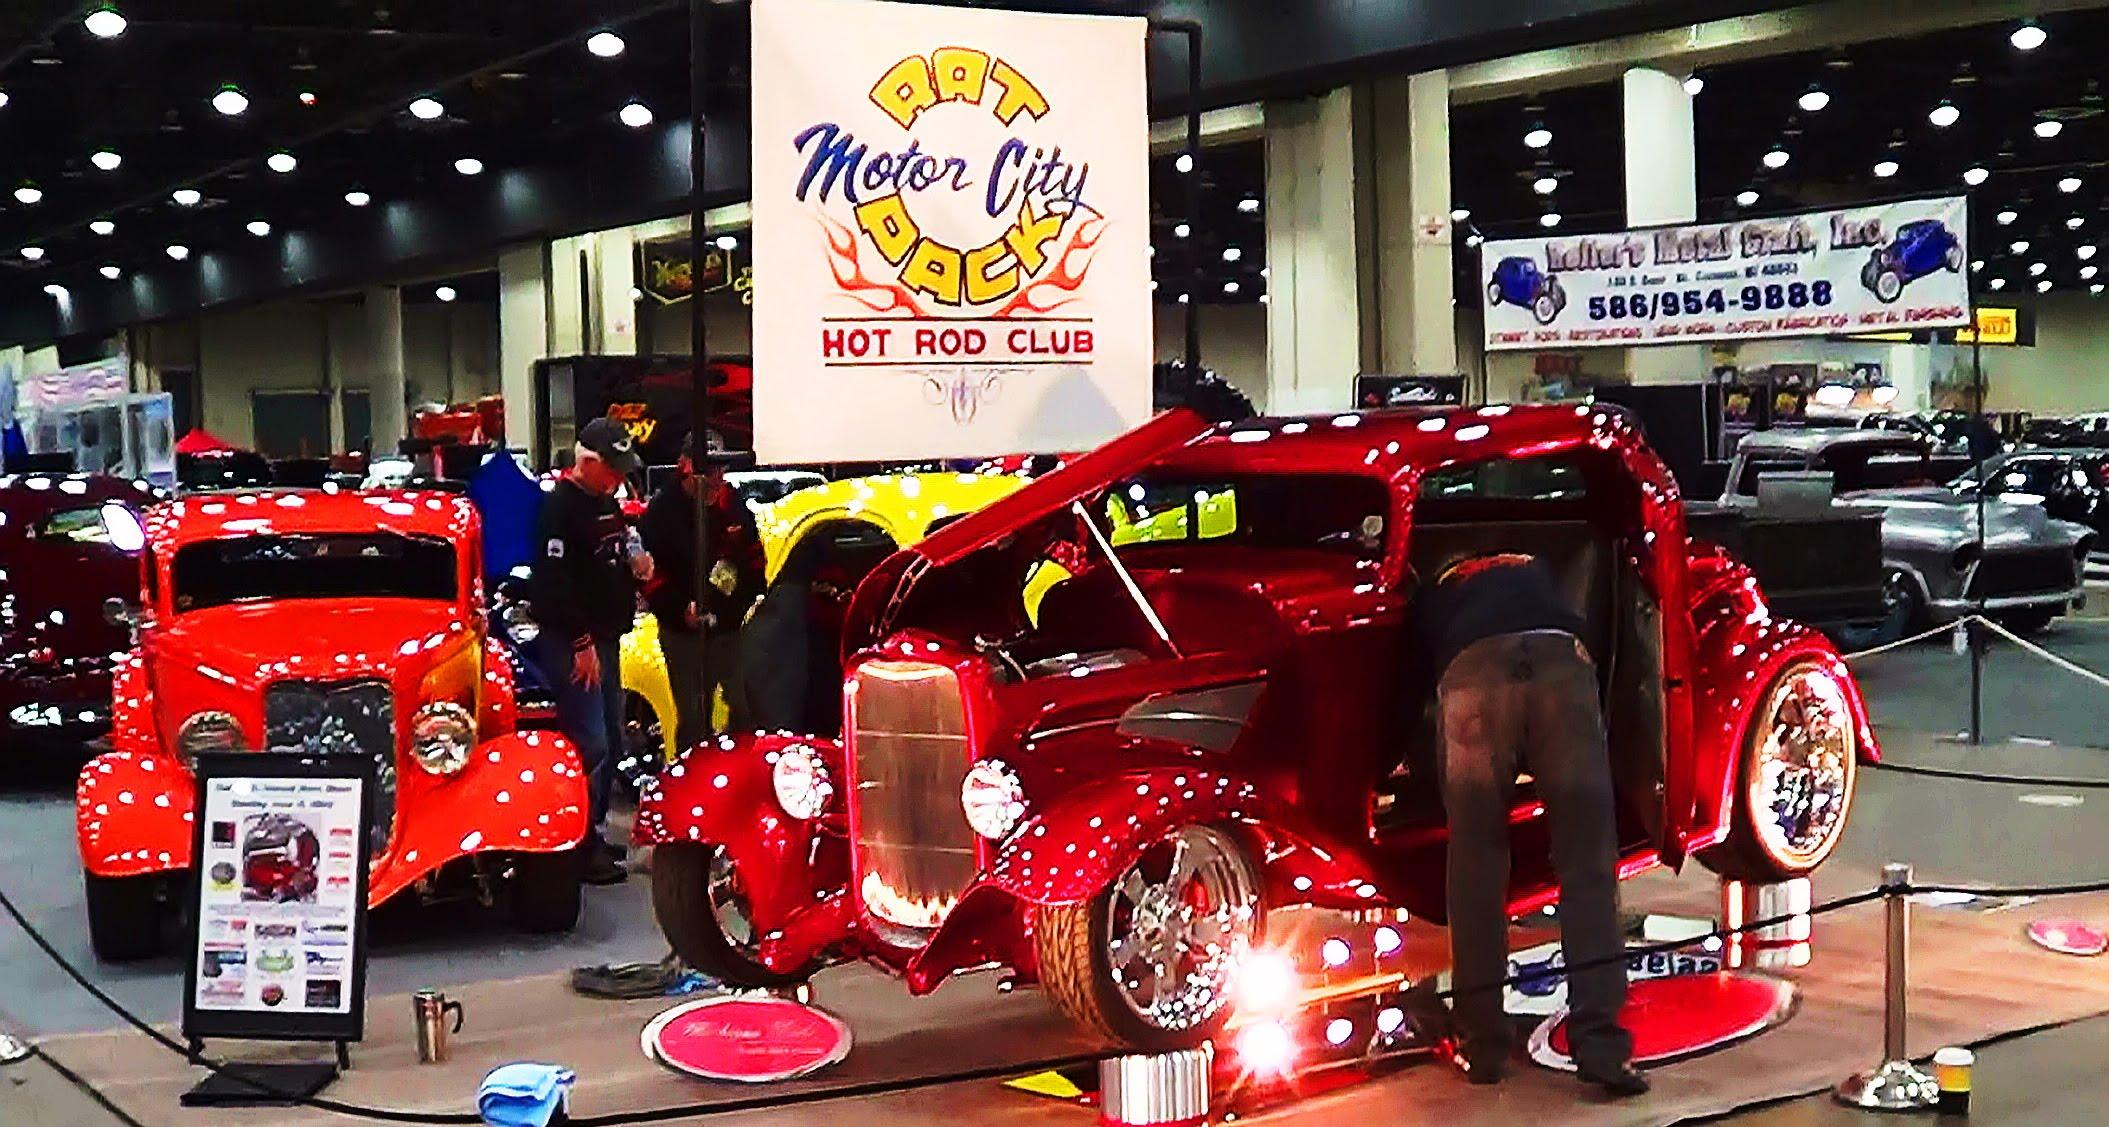 Motor city rat pack car club detroit autorama 2013 for Auto motor club comparisons